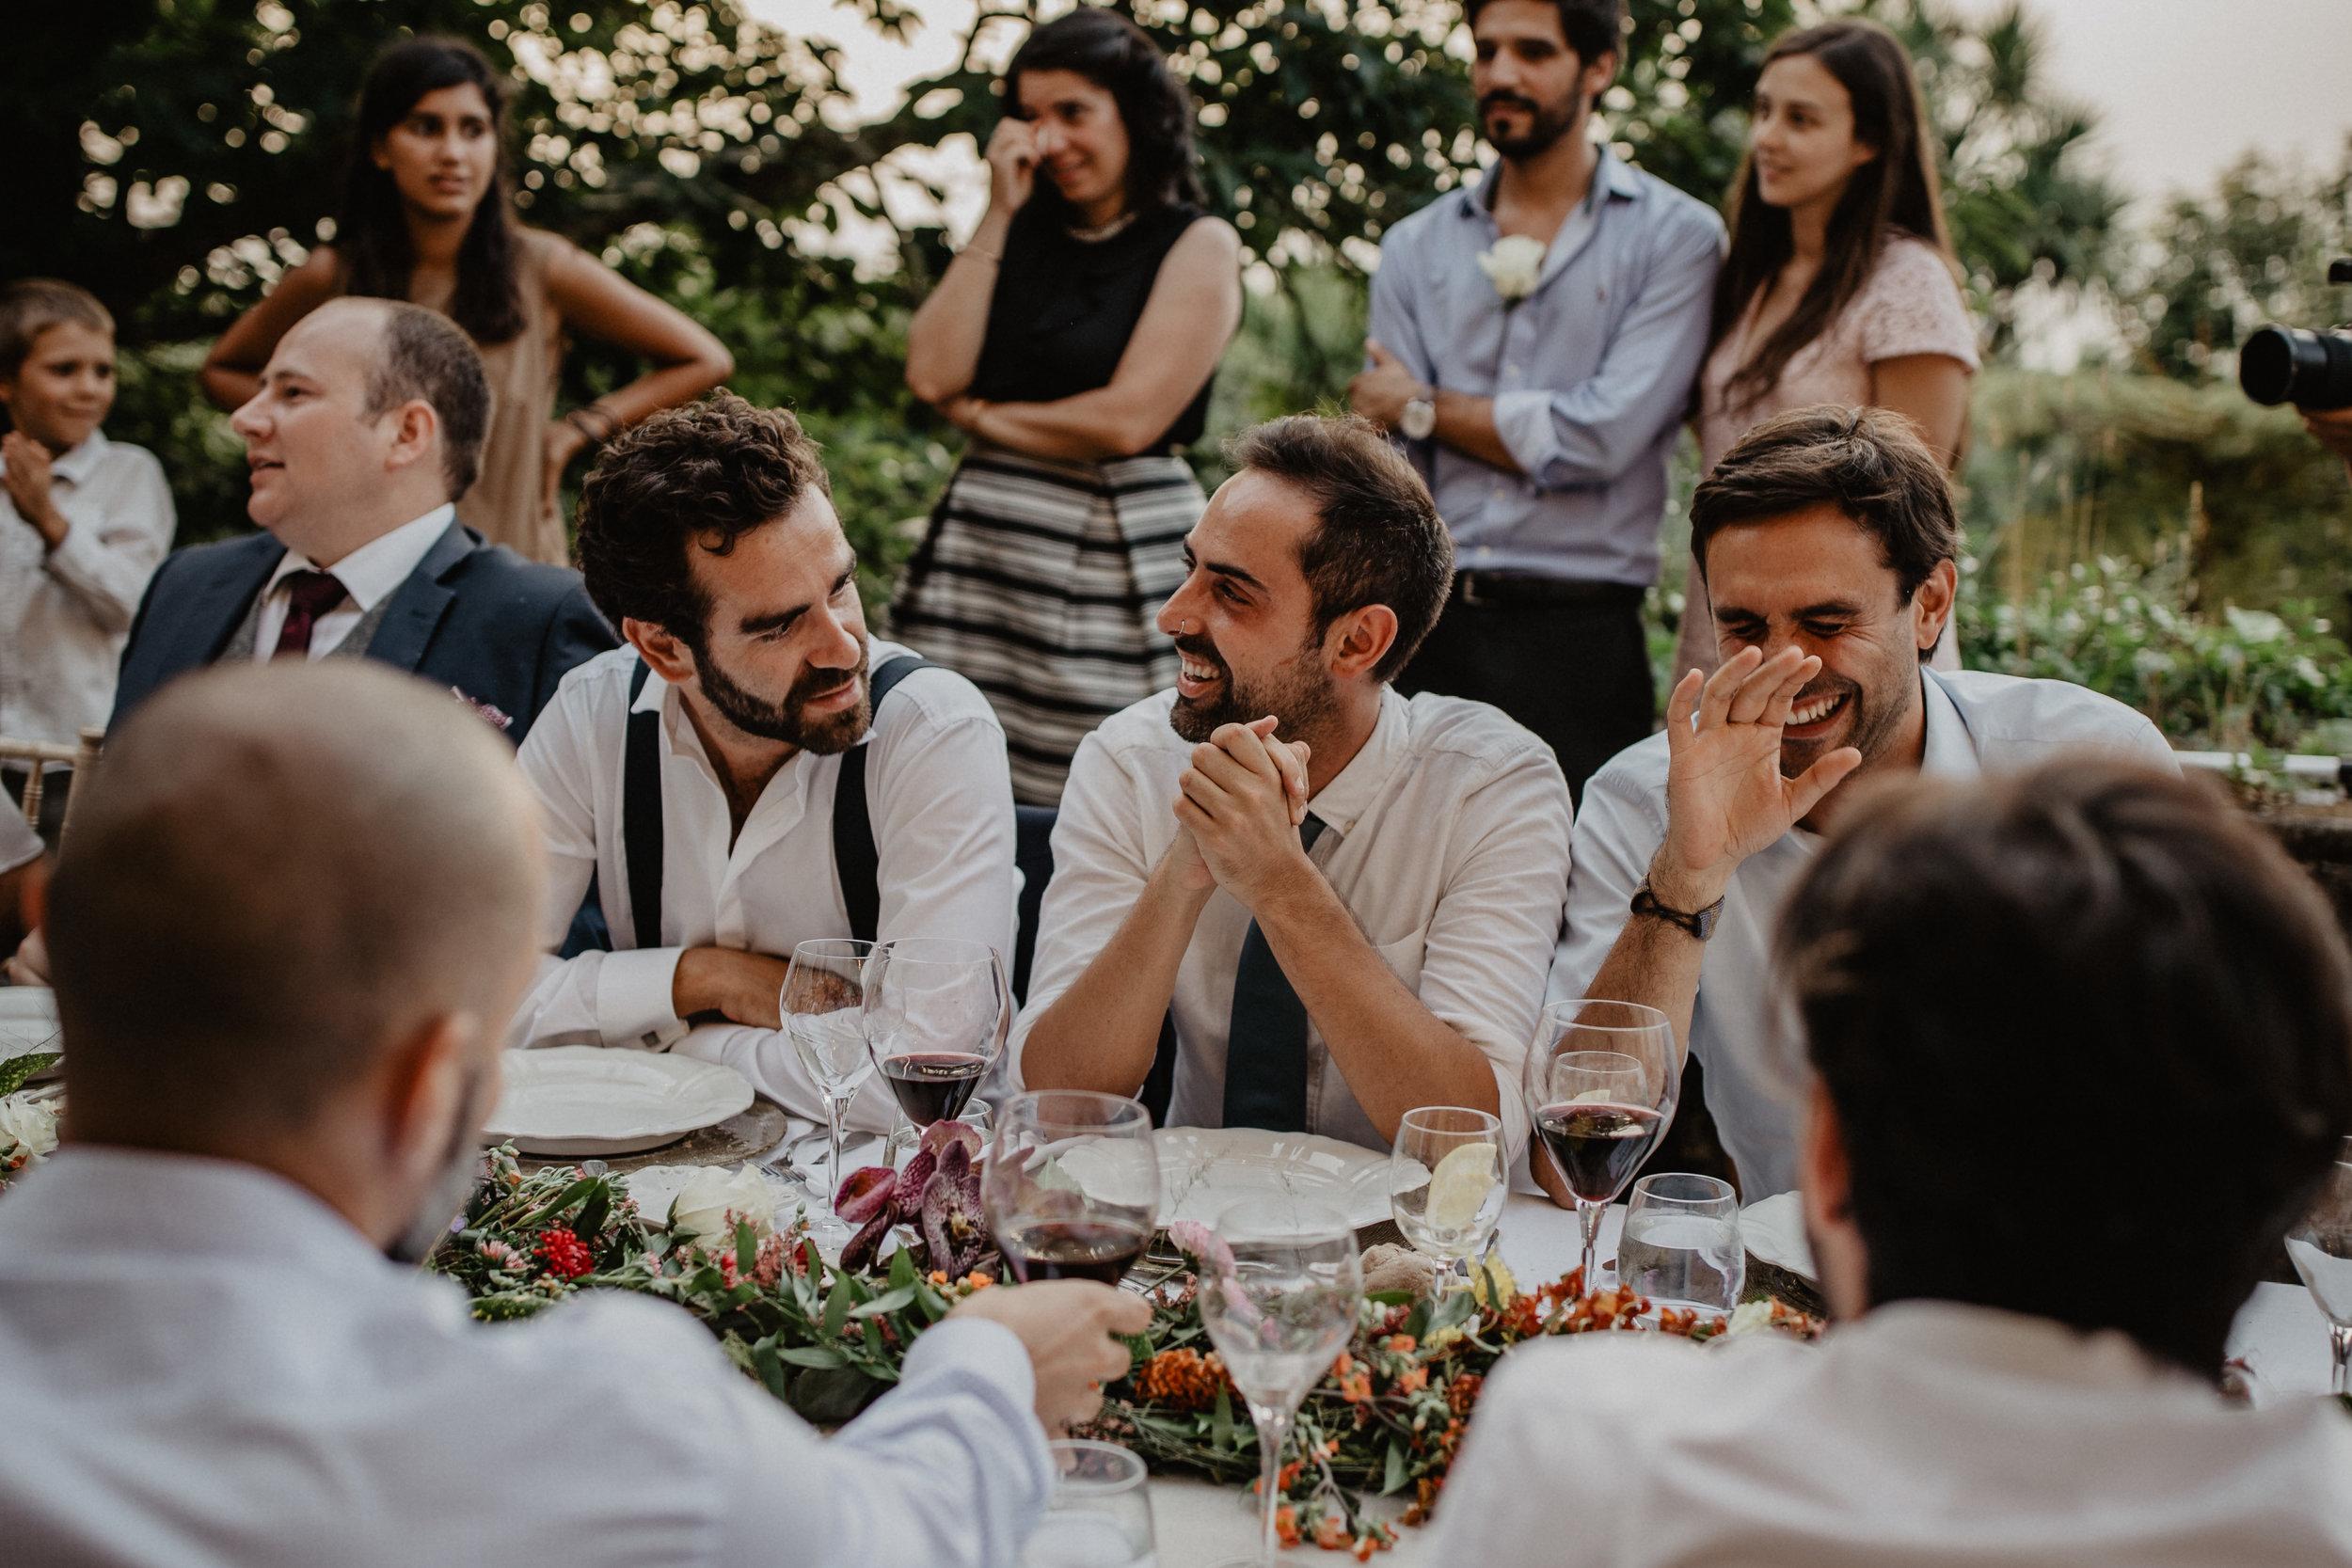 Lapela-photography-wedding-sintra-portugal-115.jpg